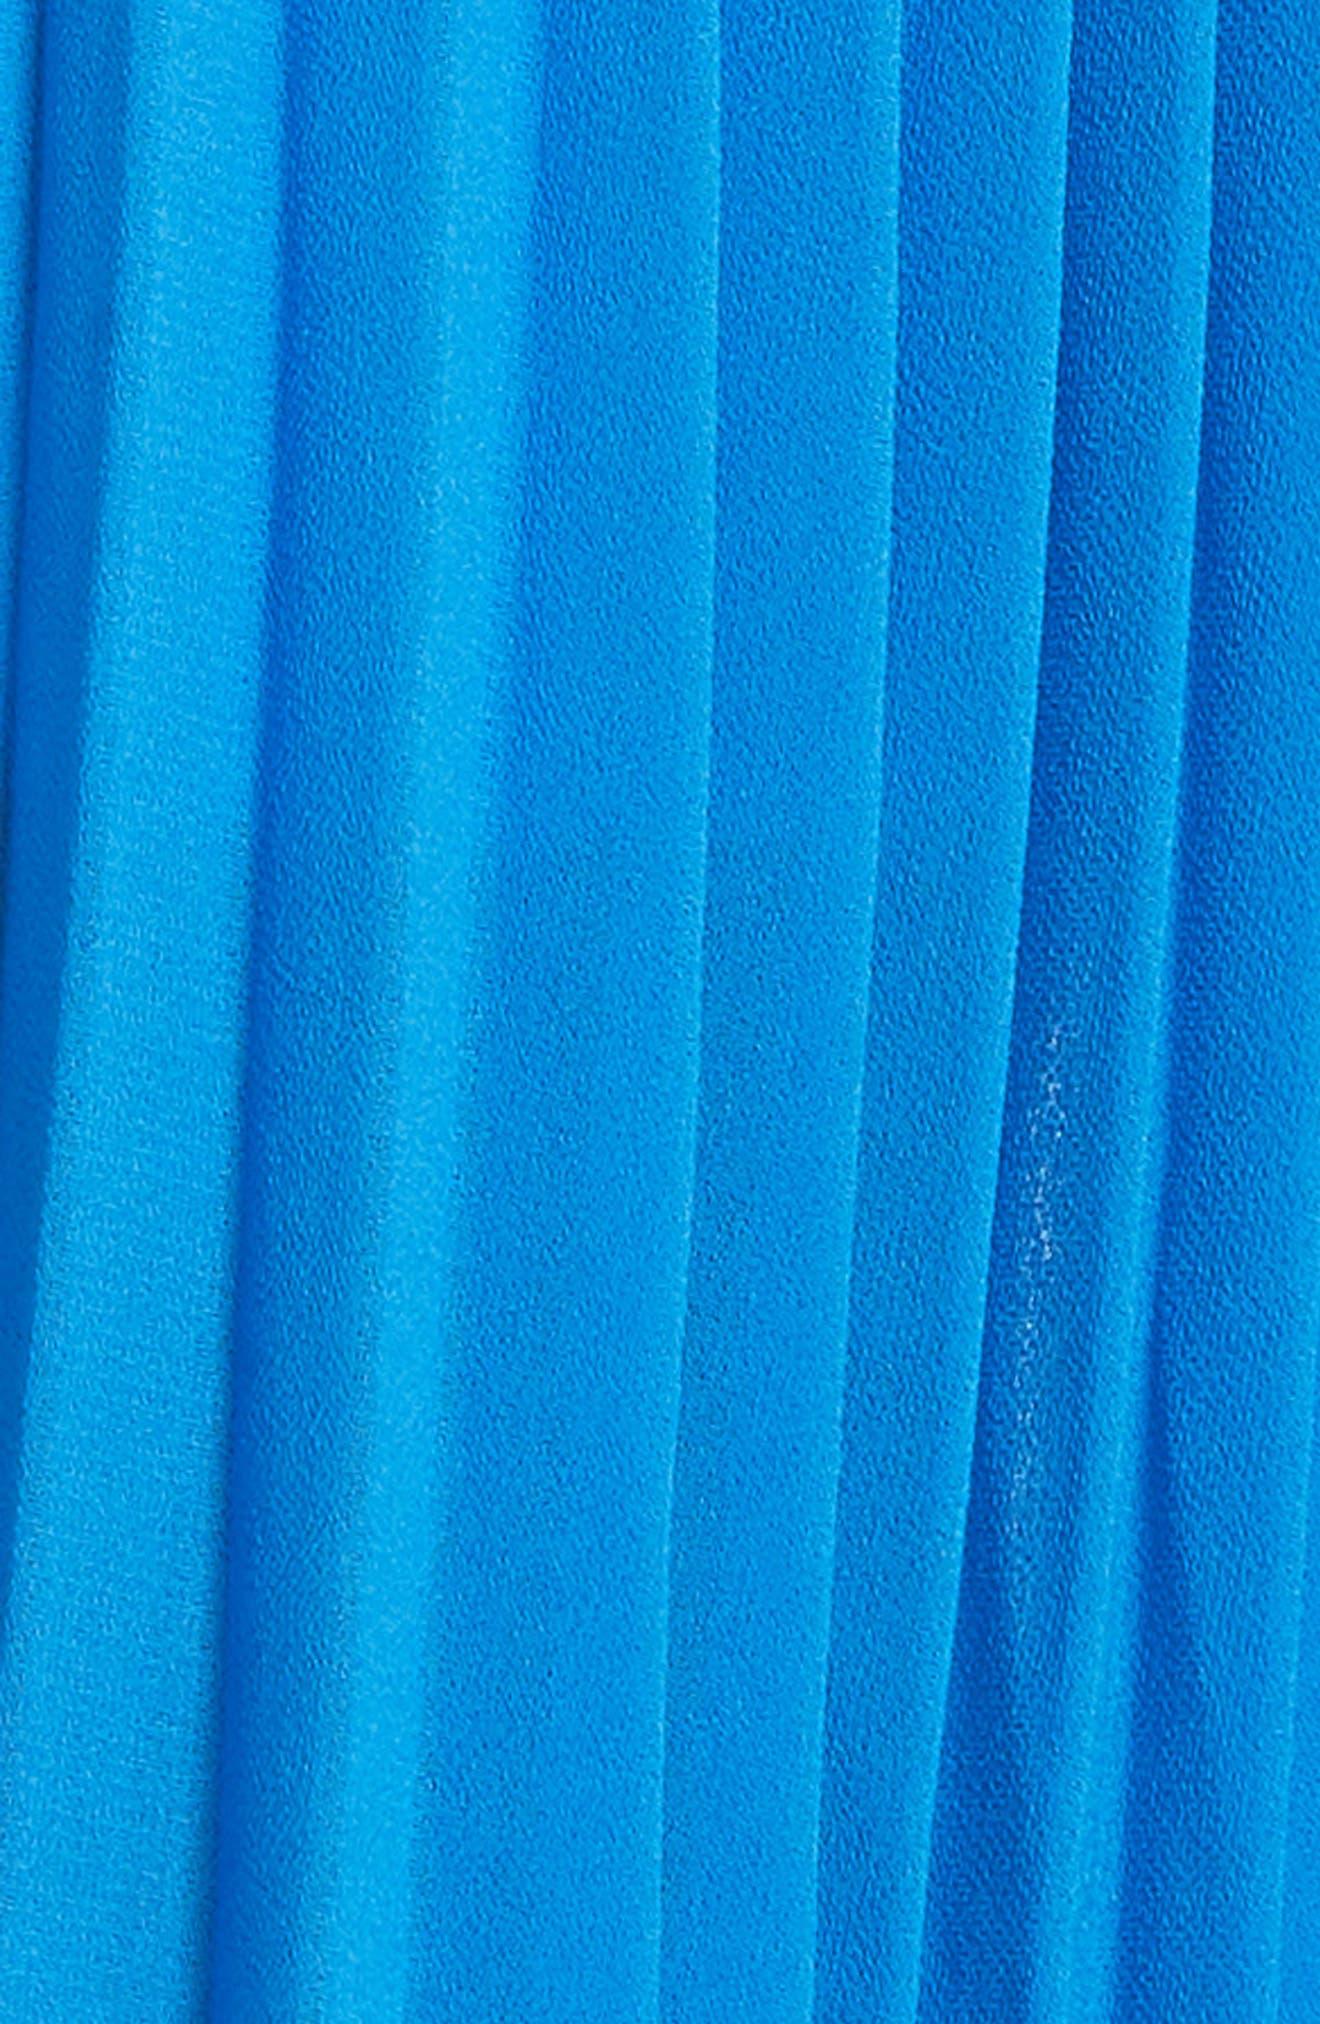 Harmony Pleat High/Low Dress,                             Alternate thumbnail 5, color,                             Bright Blue